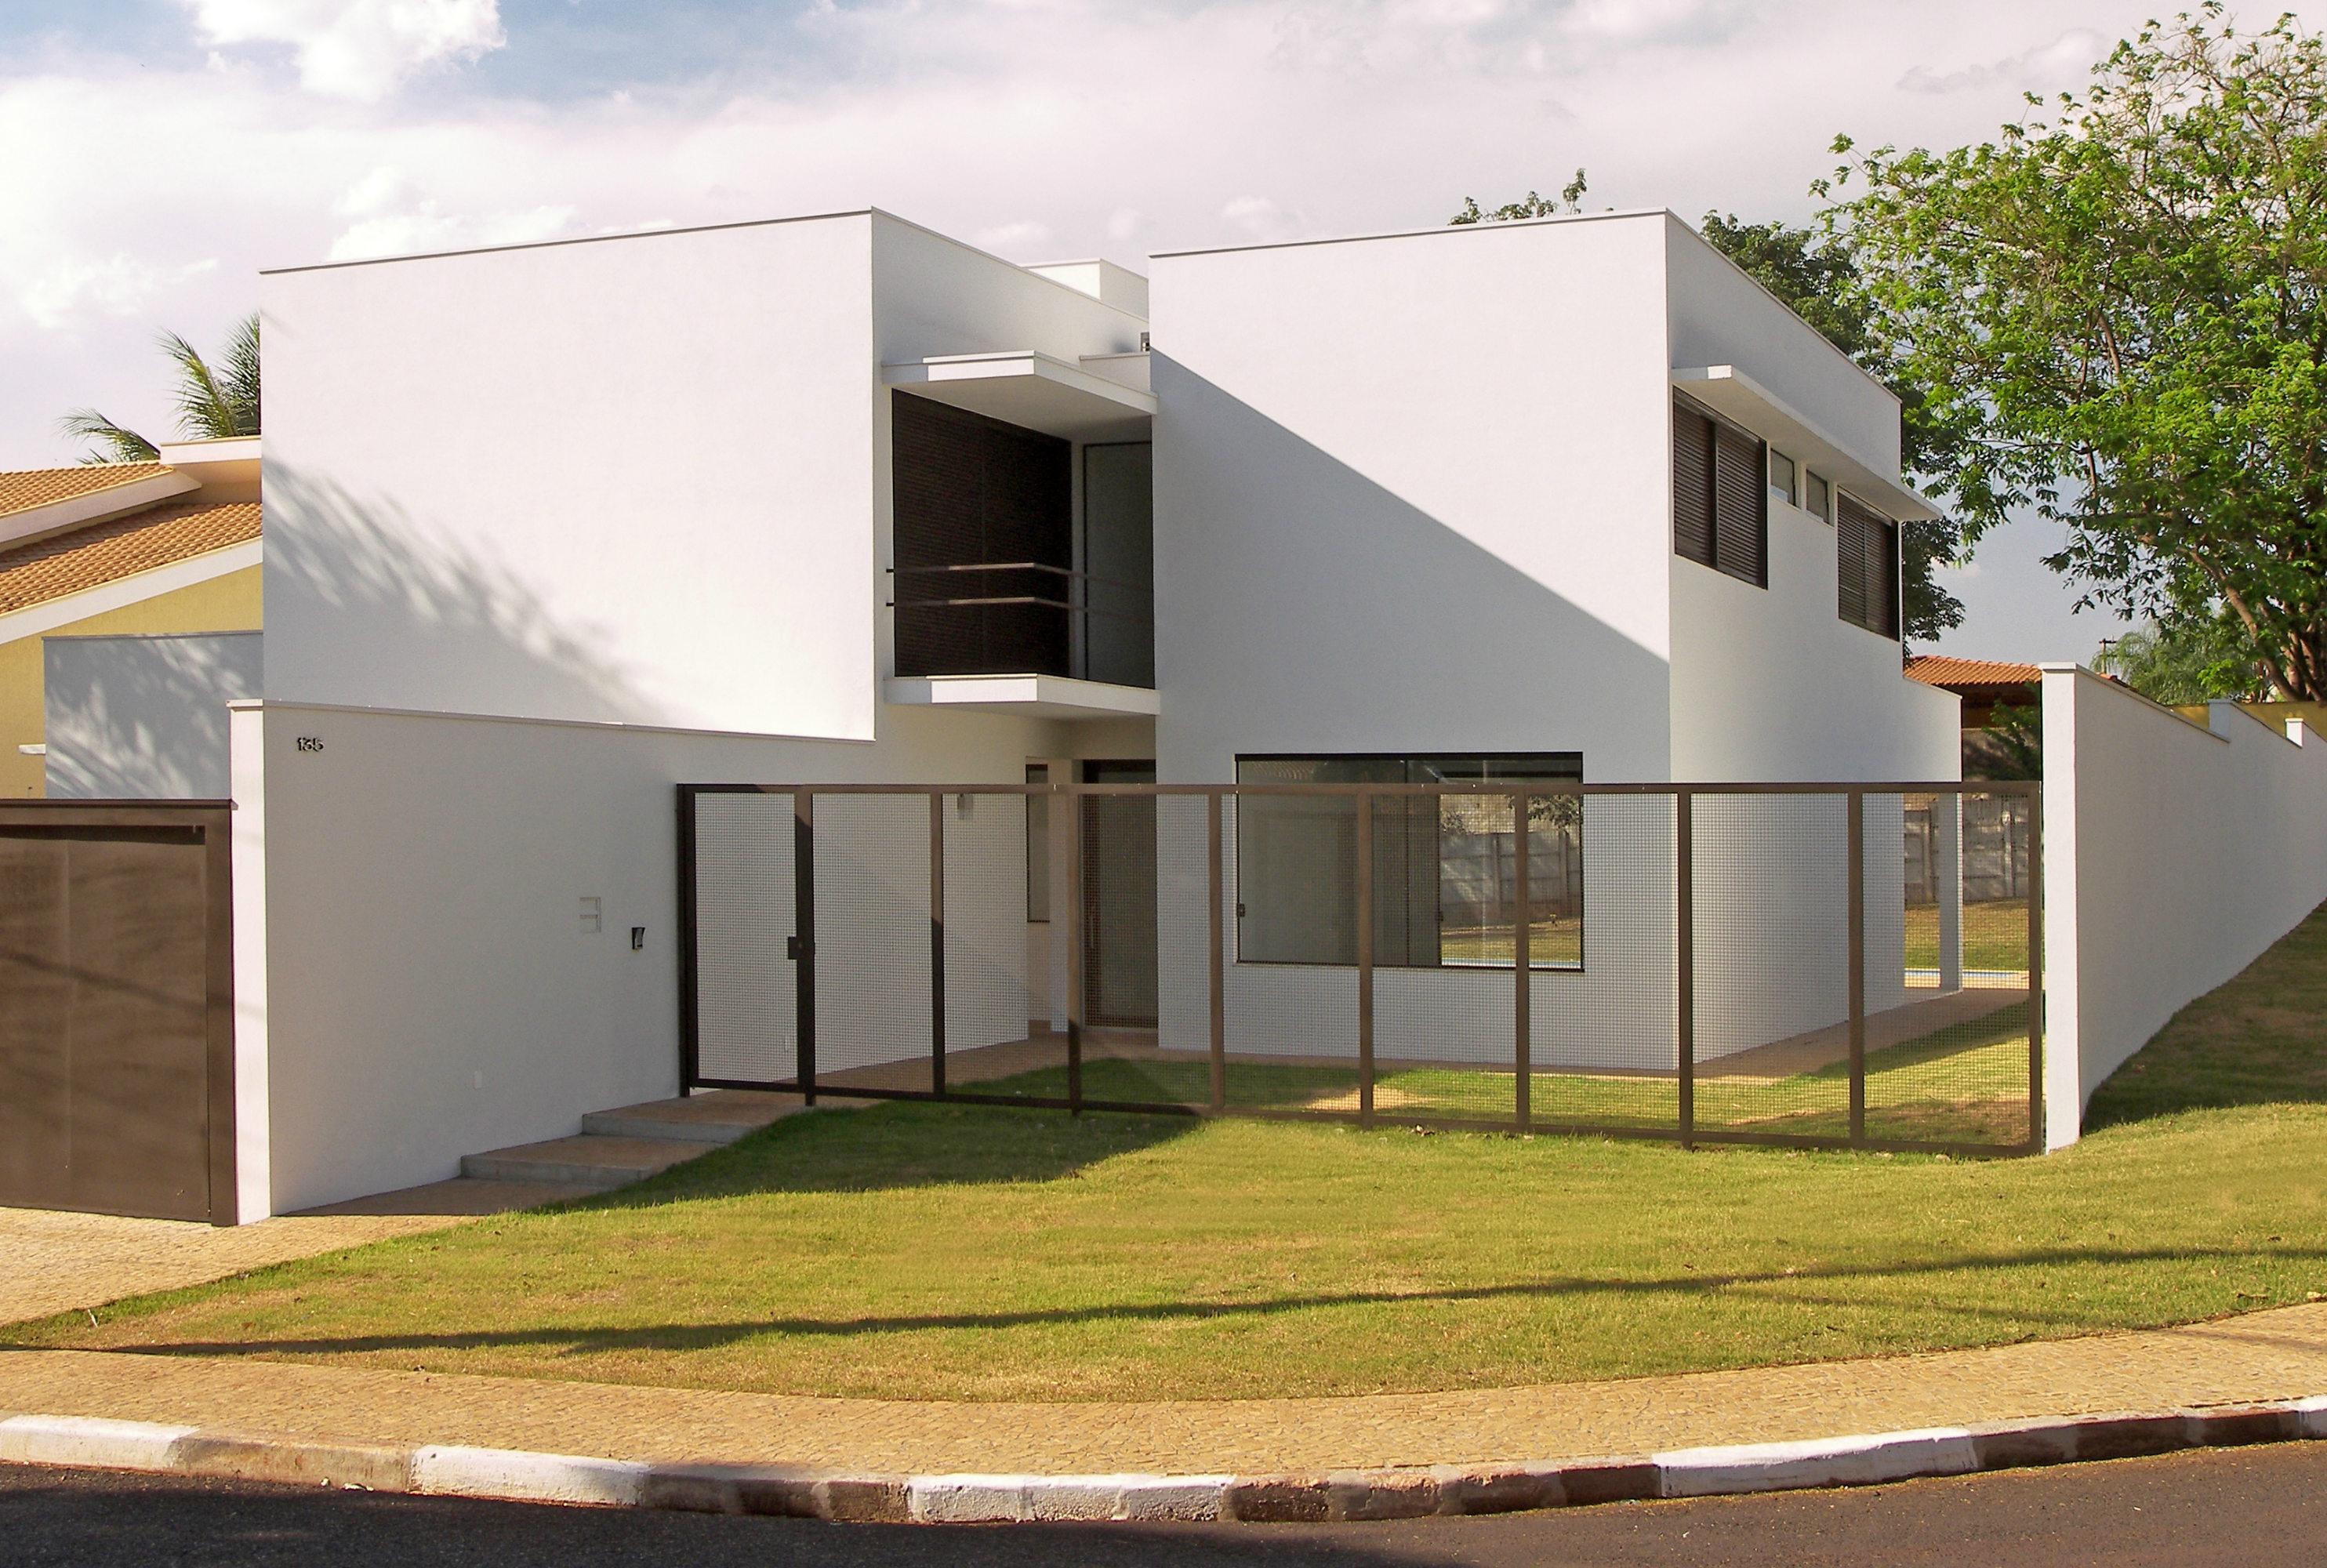 joel_pereira_arquitetura_residencia_minimalista_arquiteto_riberiao_preto_volume_arquitetonico 1